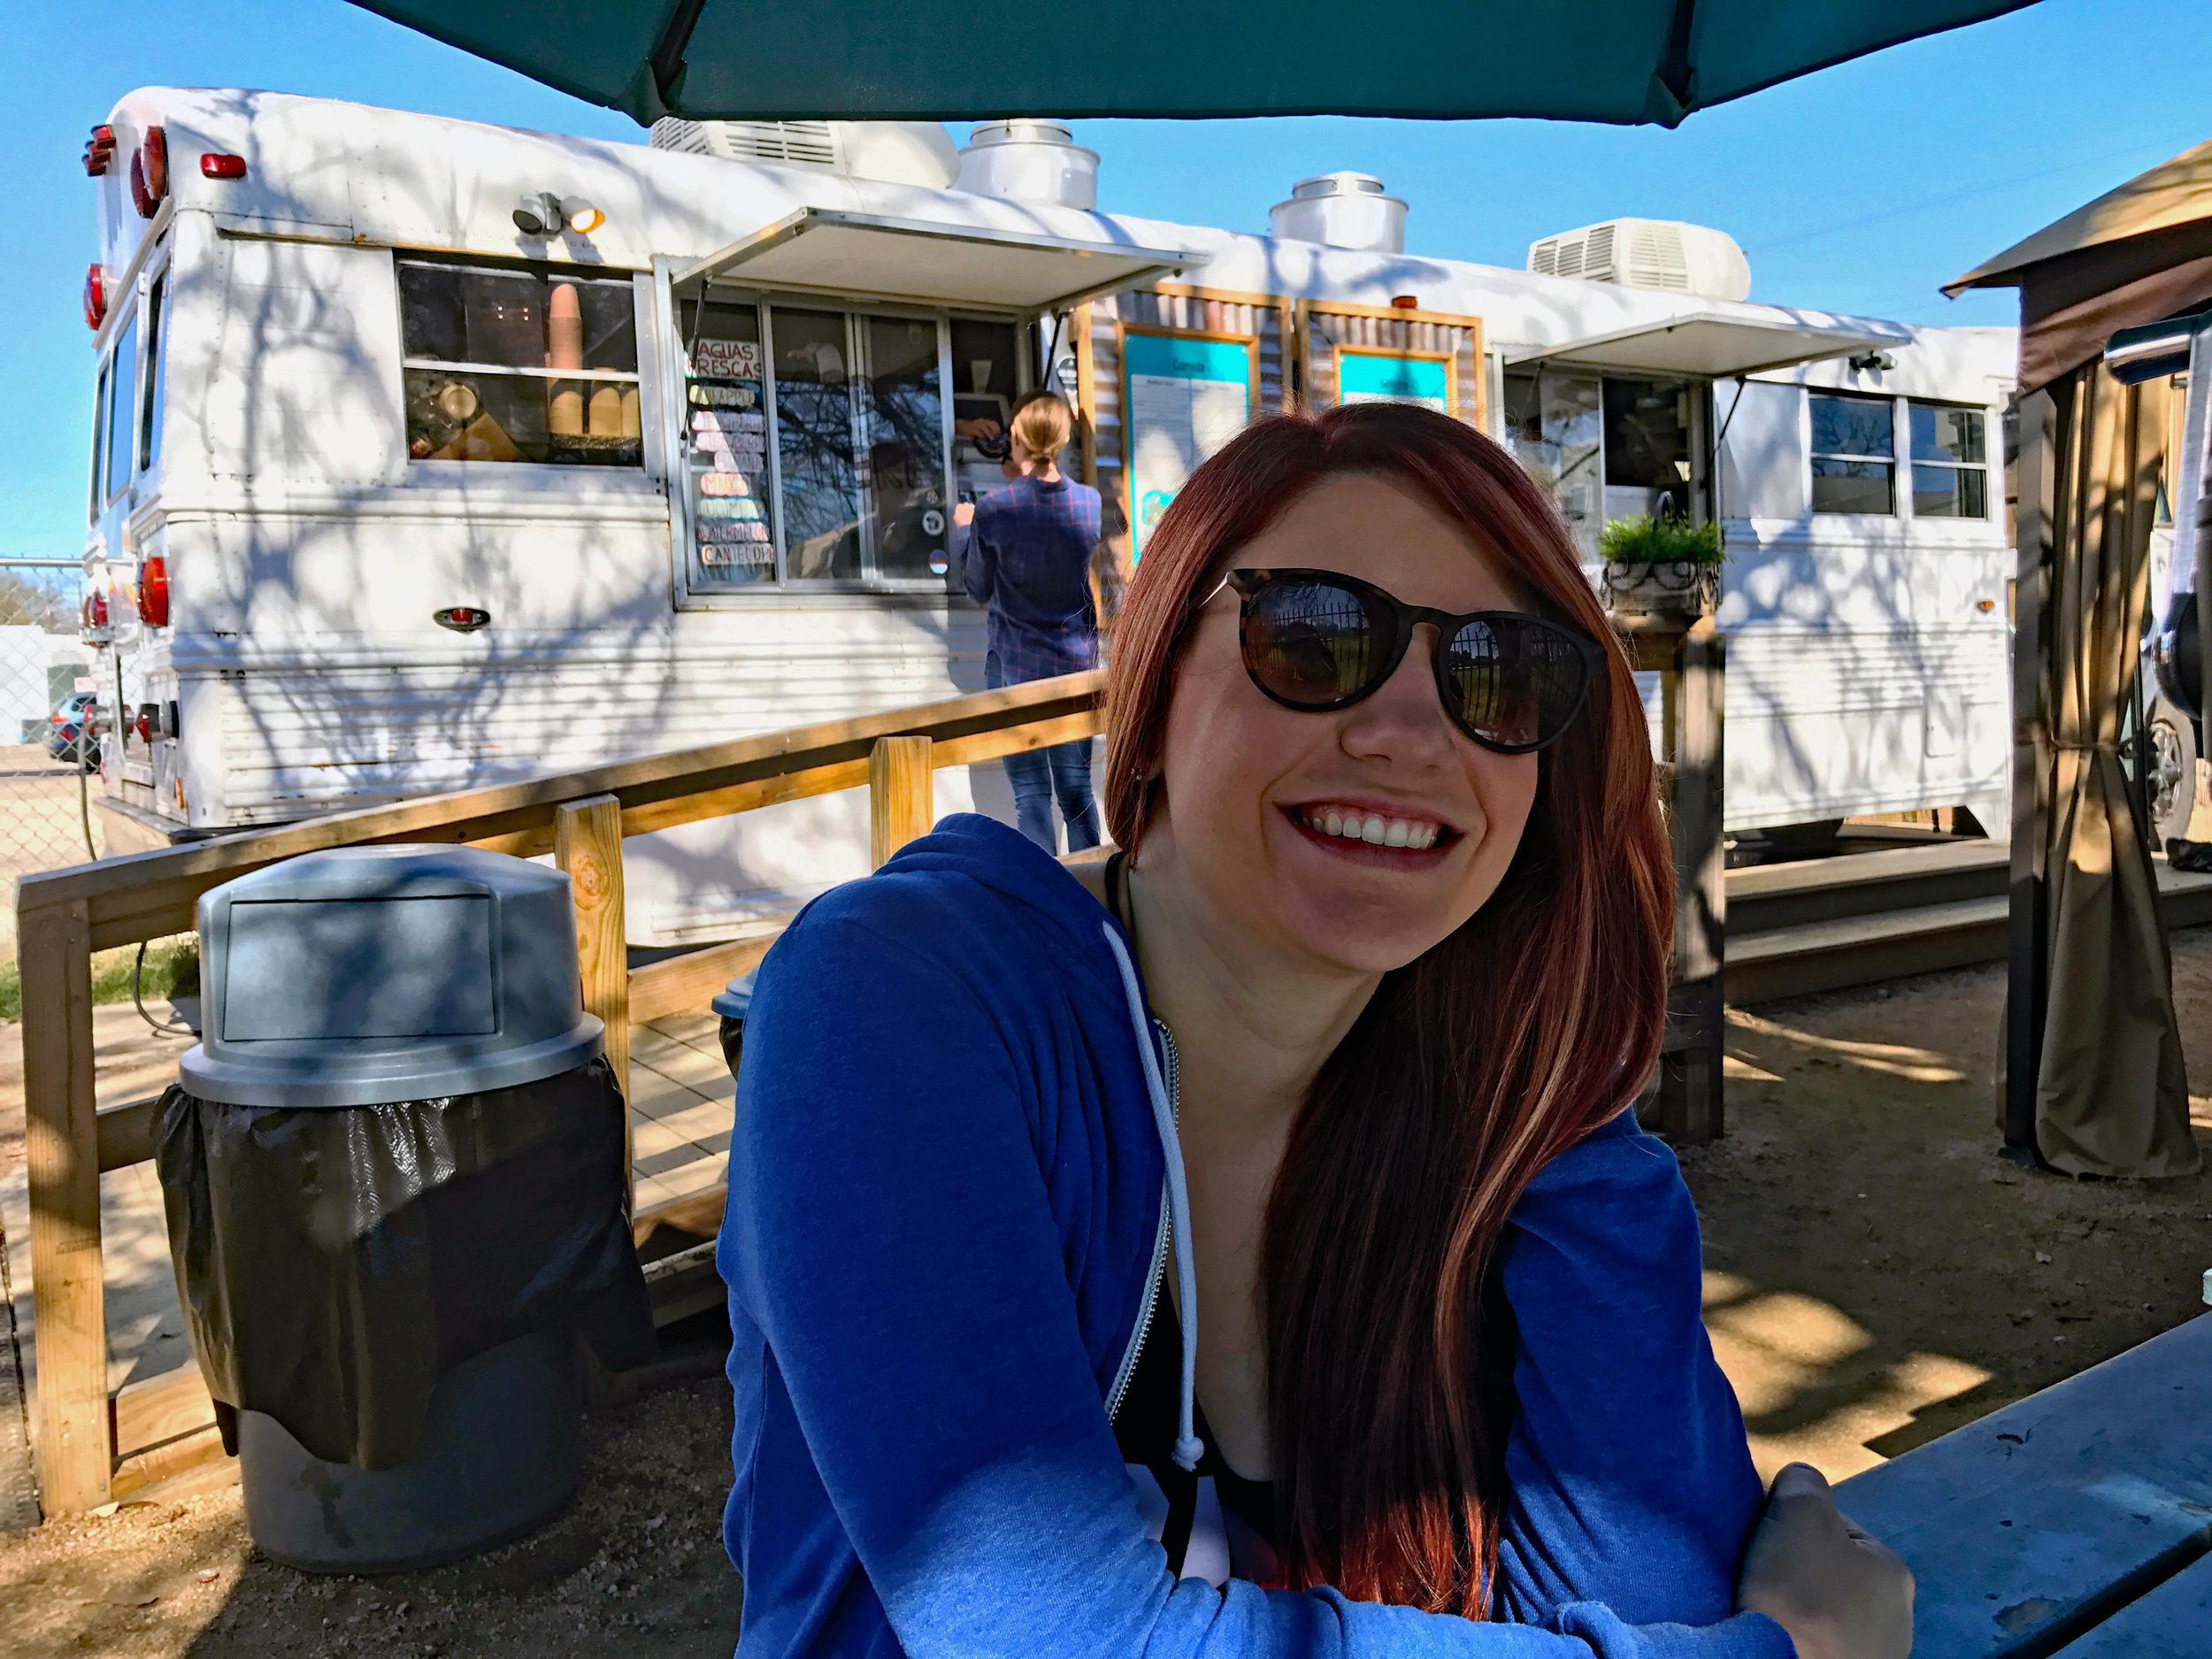 Deanna at Veracruz All Natural Food Truck in Austin